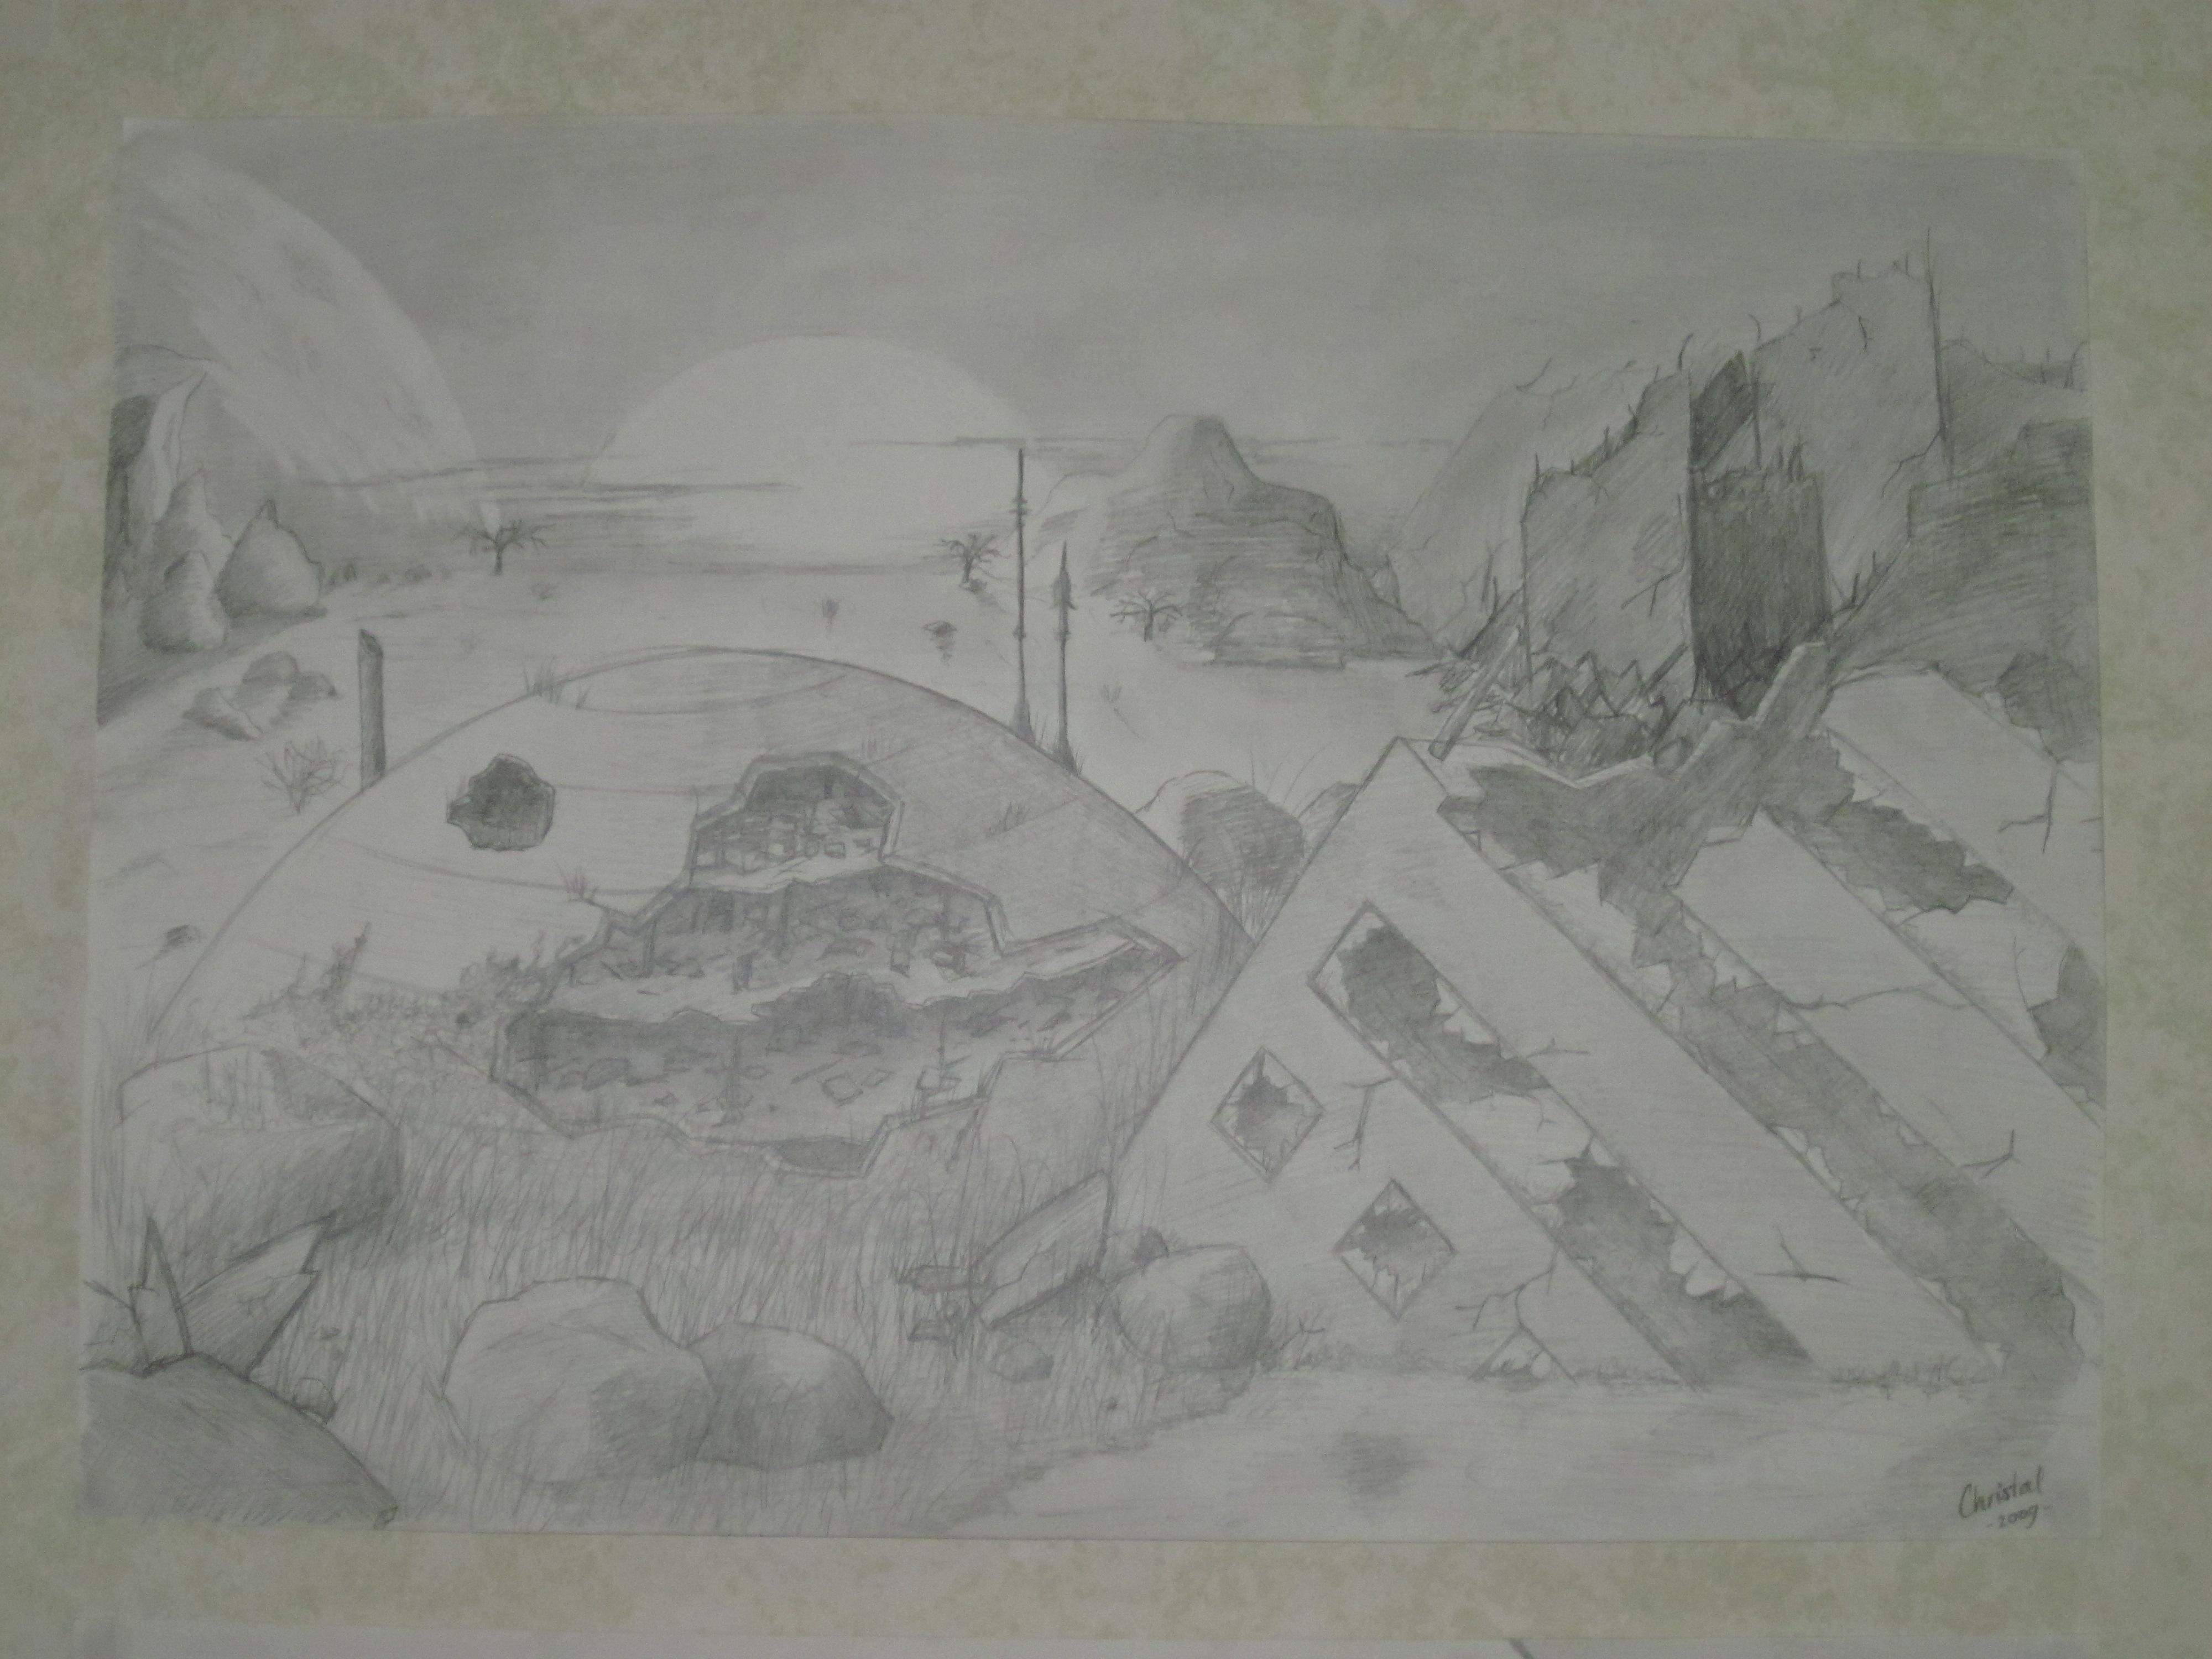 Post-apocalyptic landscape